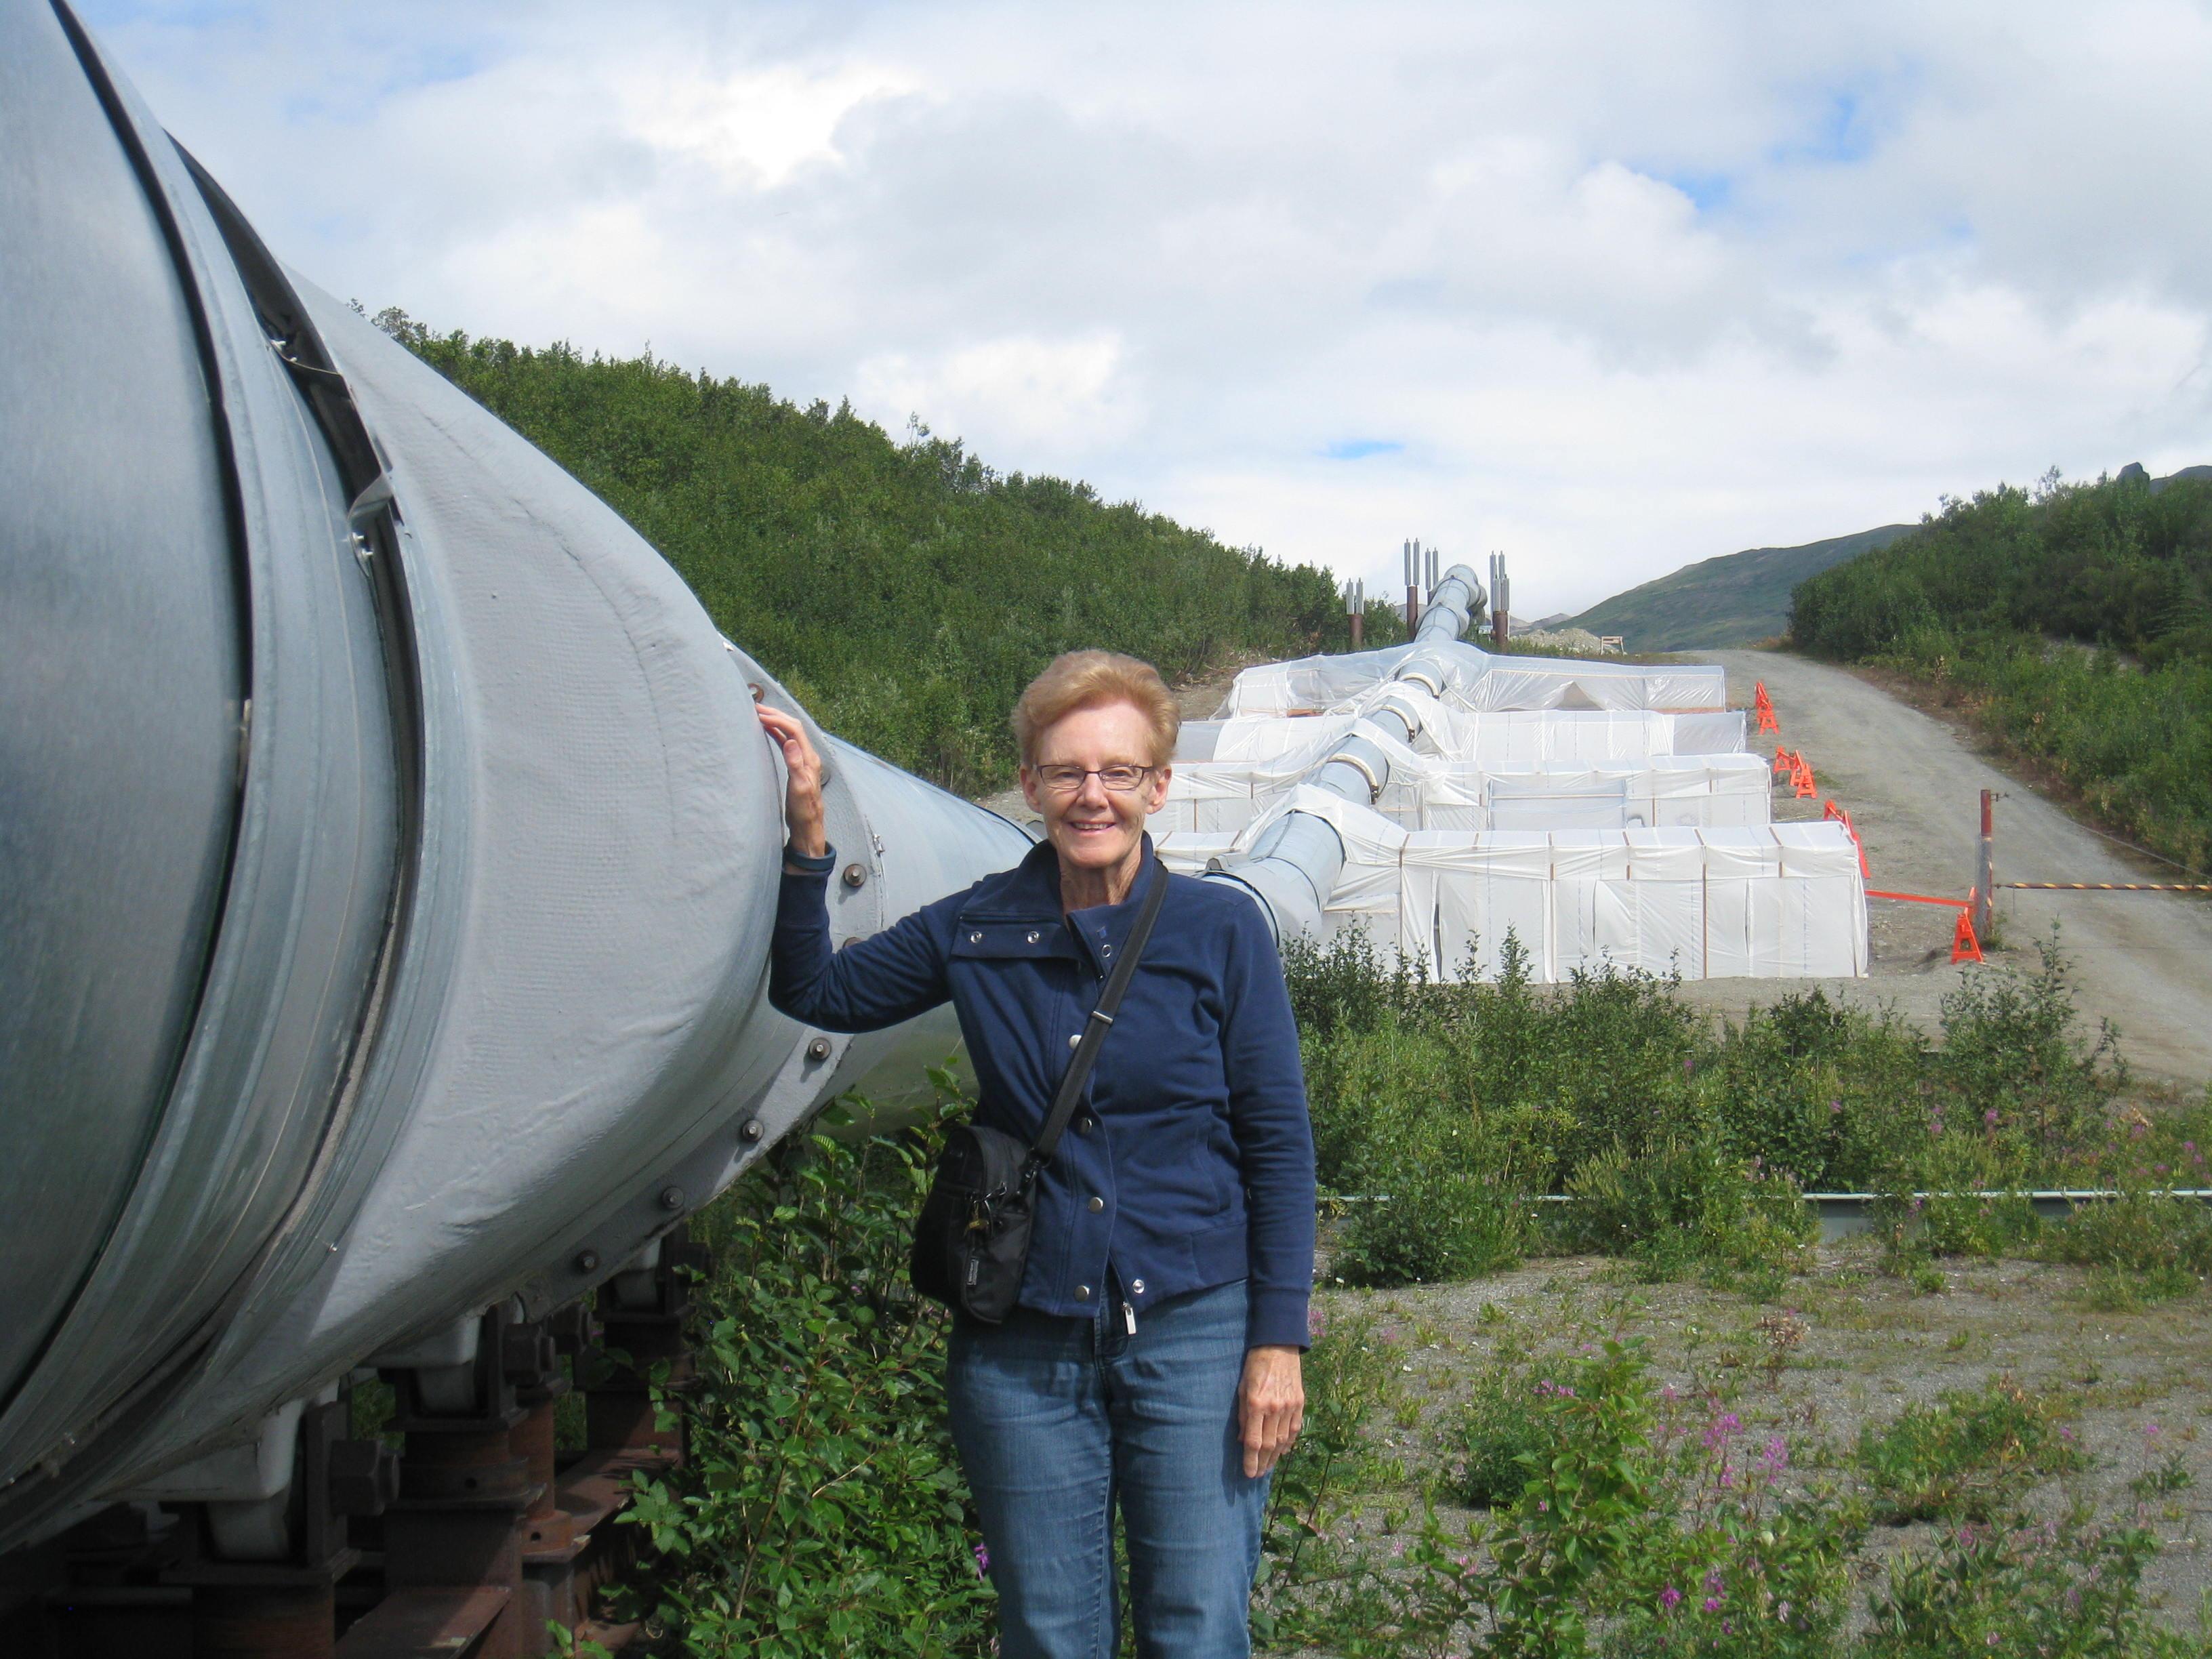 Spectacular Alaska - Alaskan Pipeline